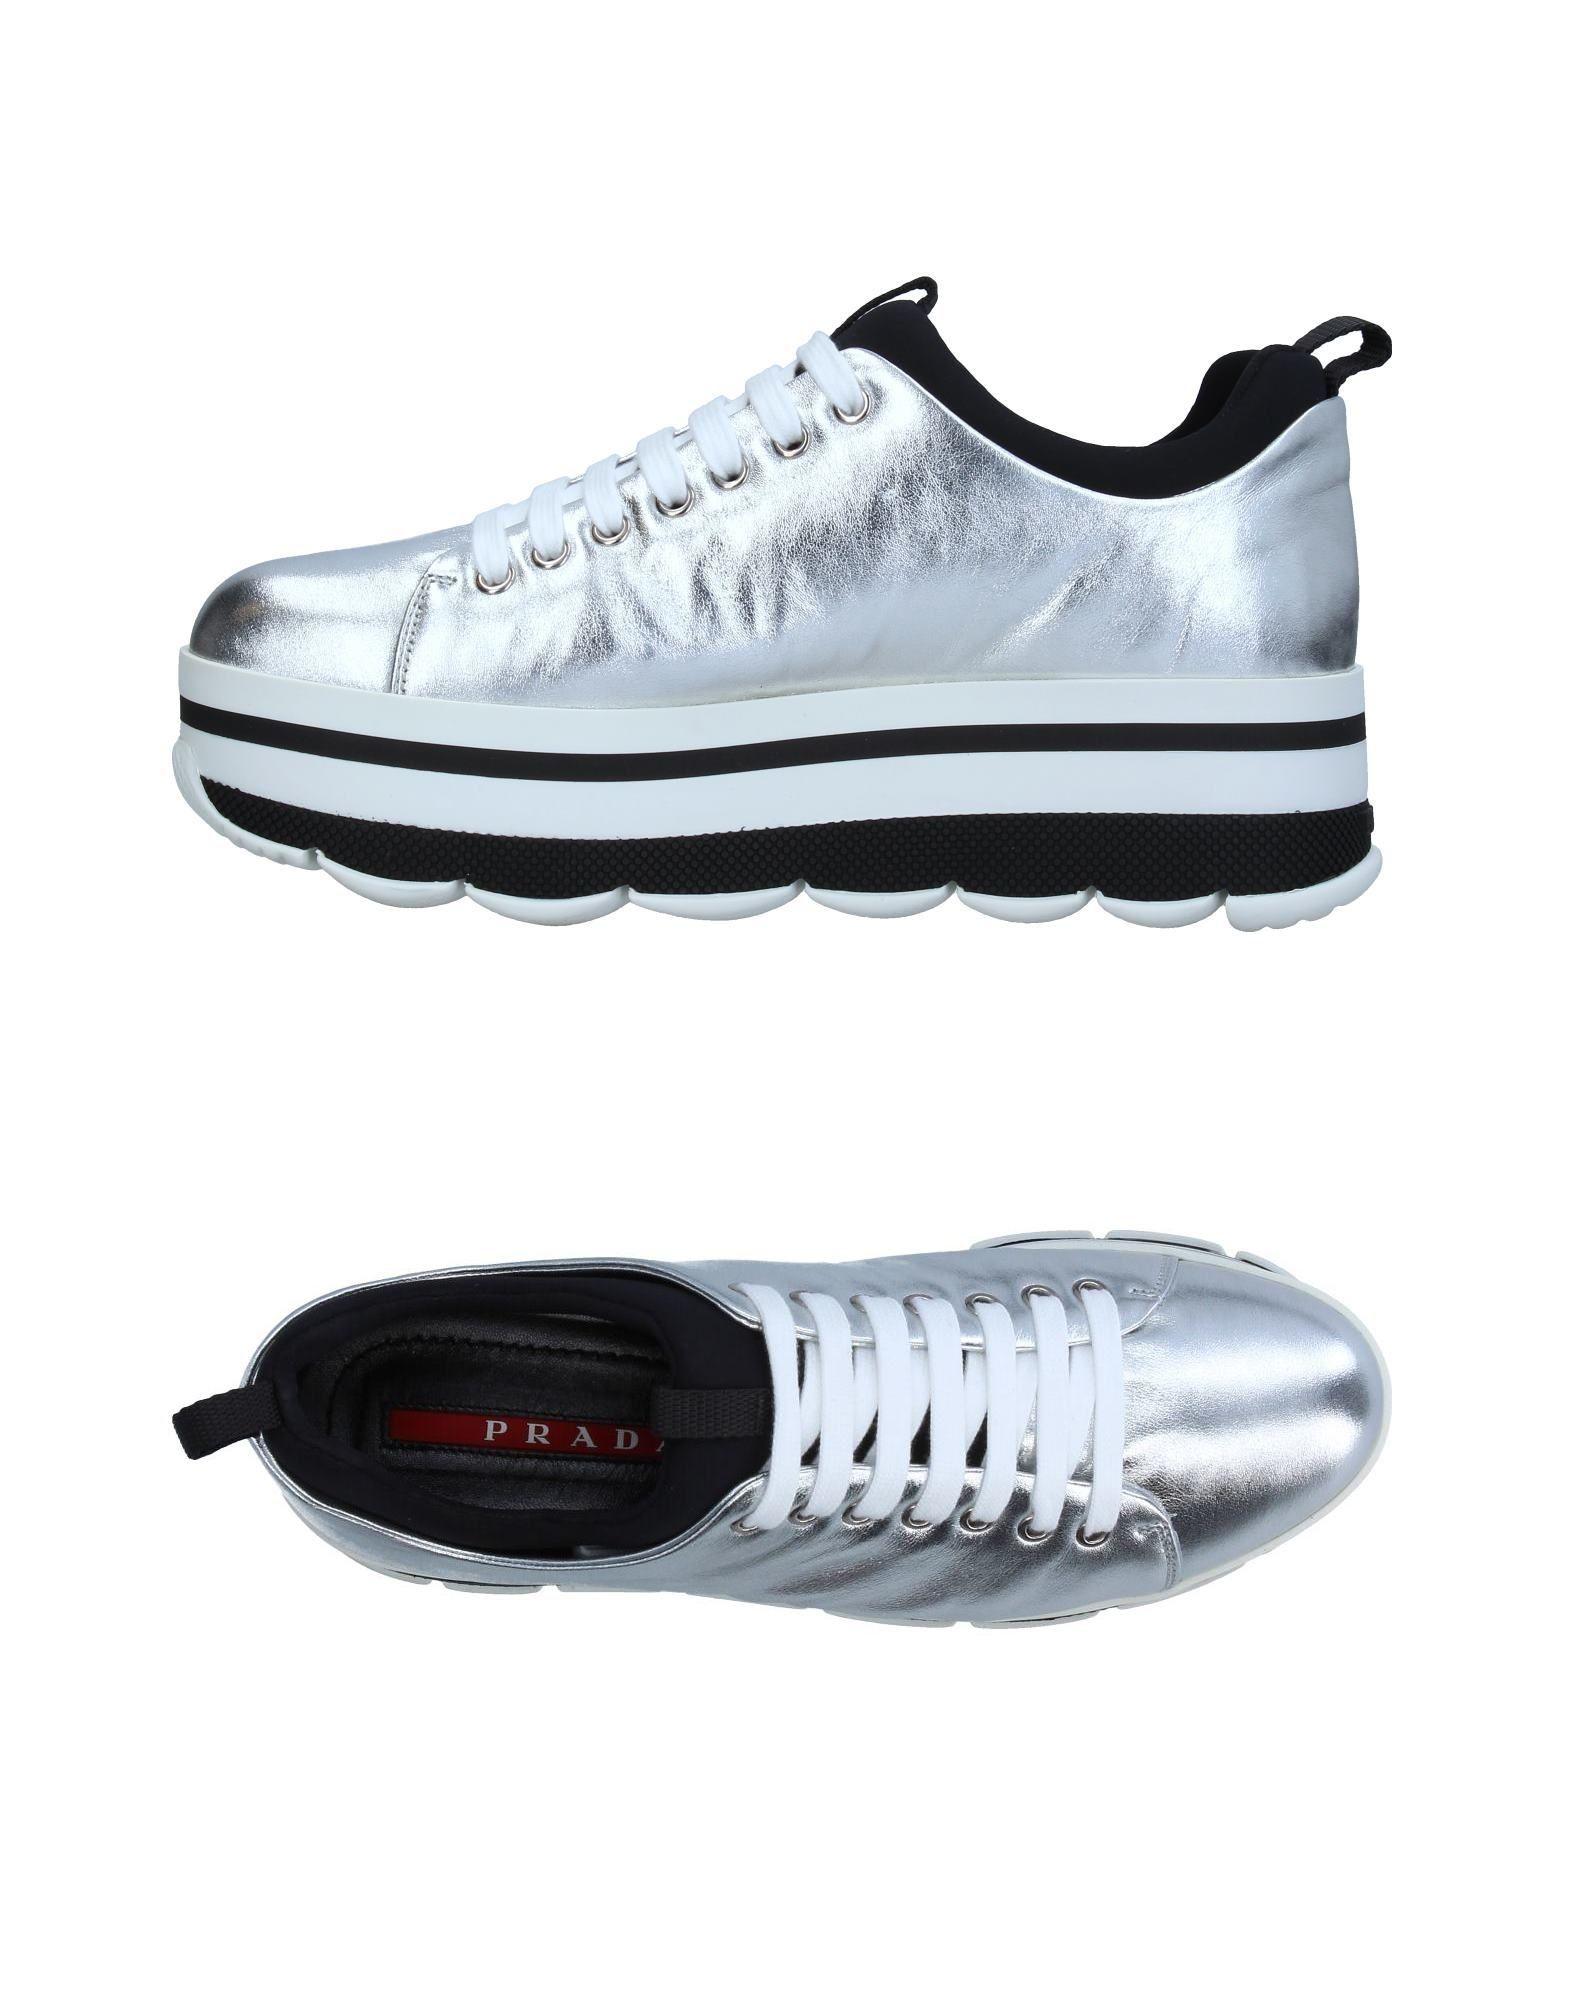 ba480ed6fdff Sneakers Prada Sport Femme Sneakers Prada Sport sur jNw8tOC ...